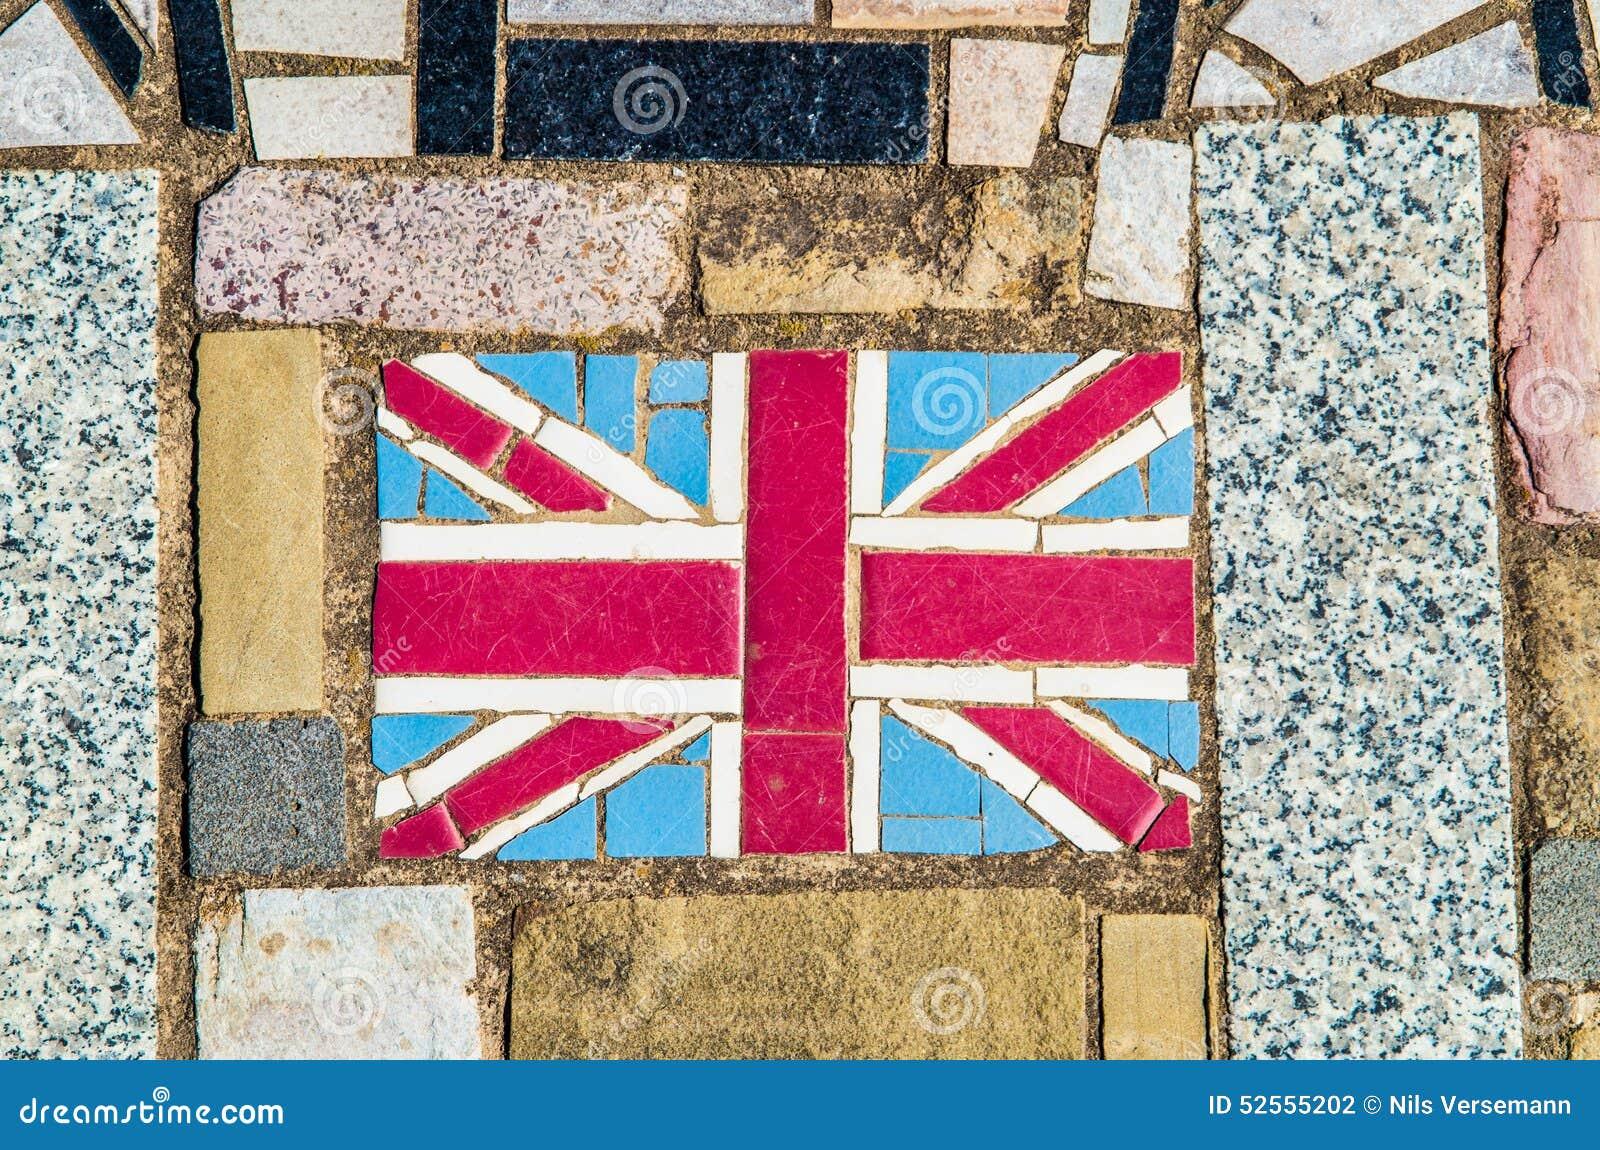 Mosaic of the Union Jack, the national flag of the United Kingdom